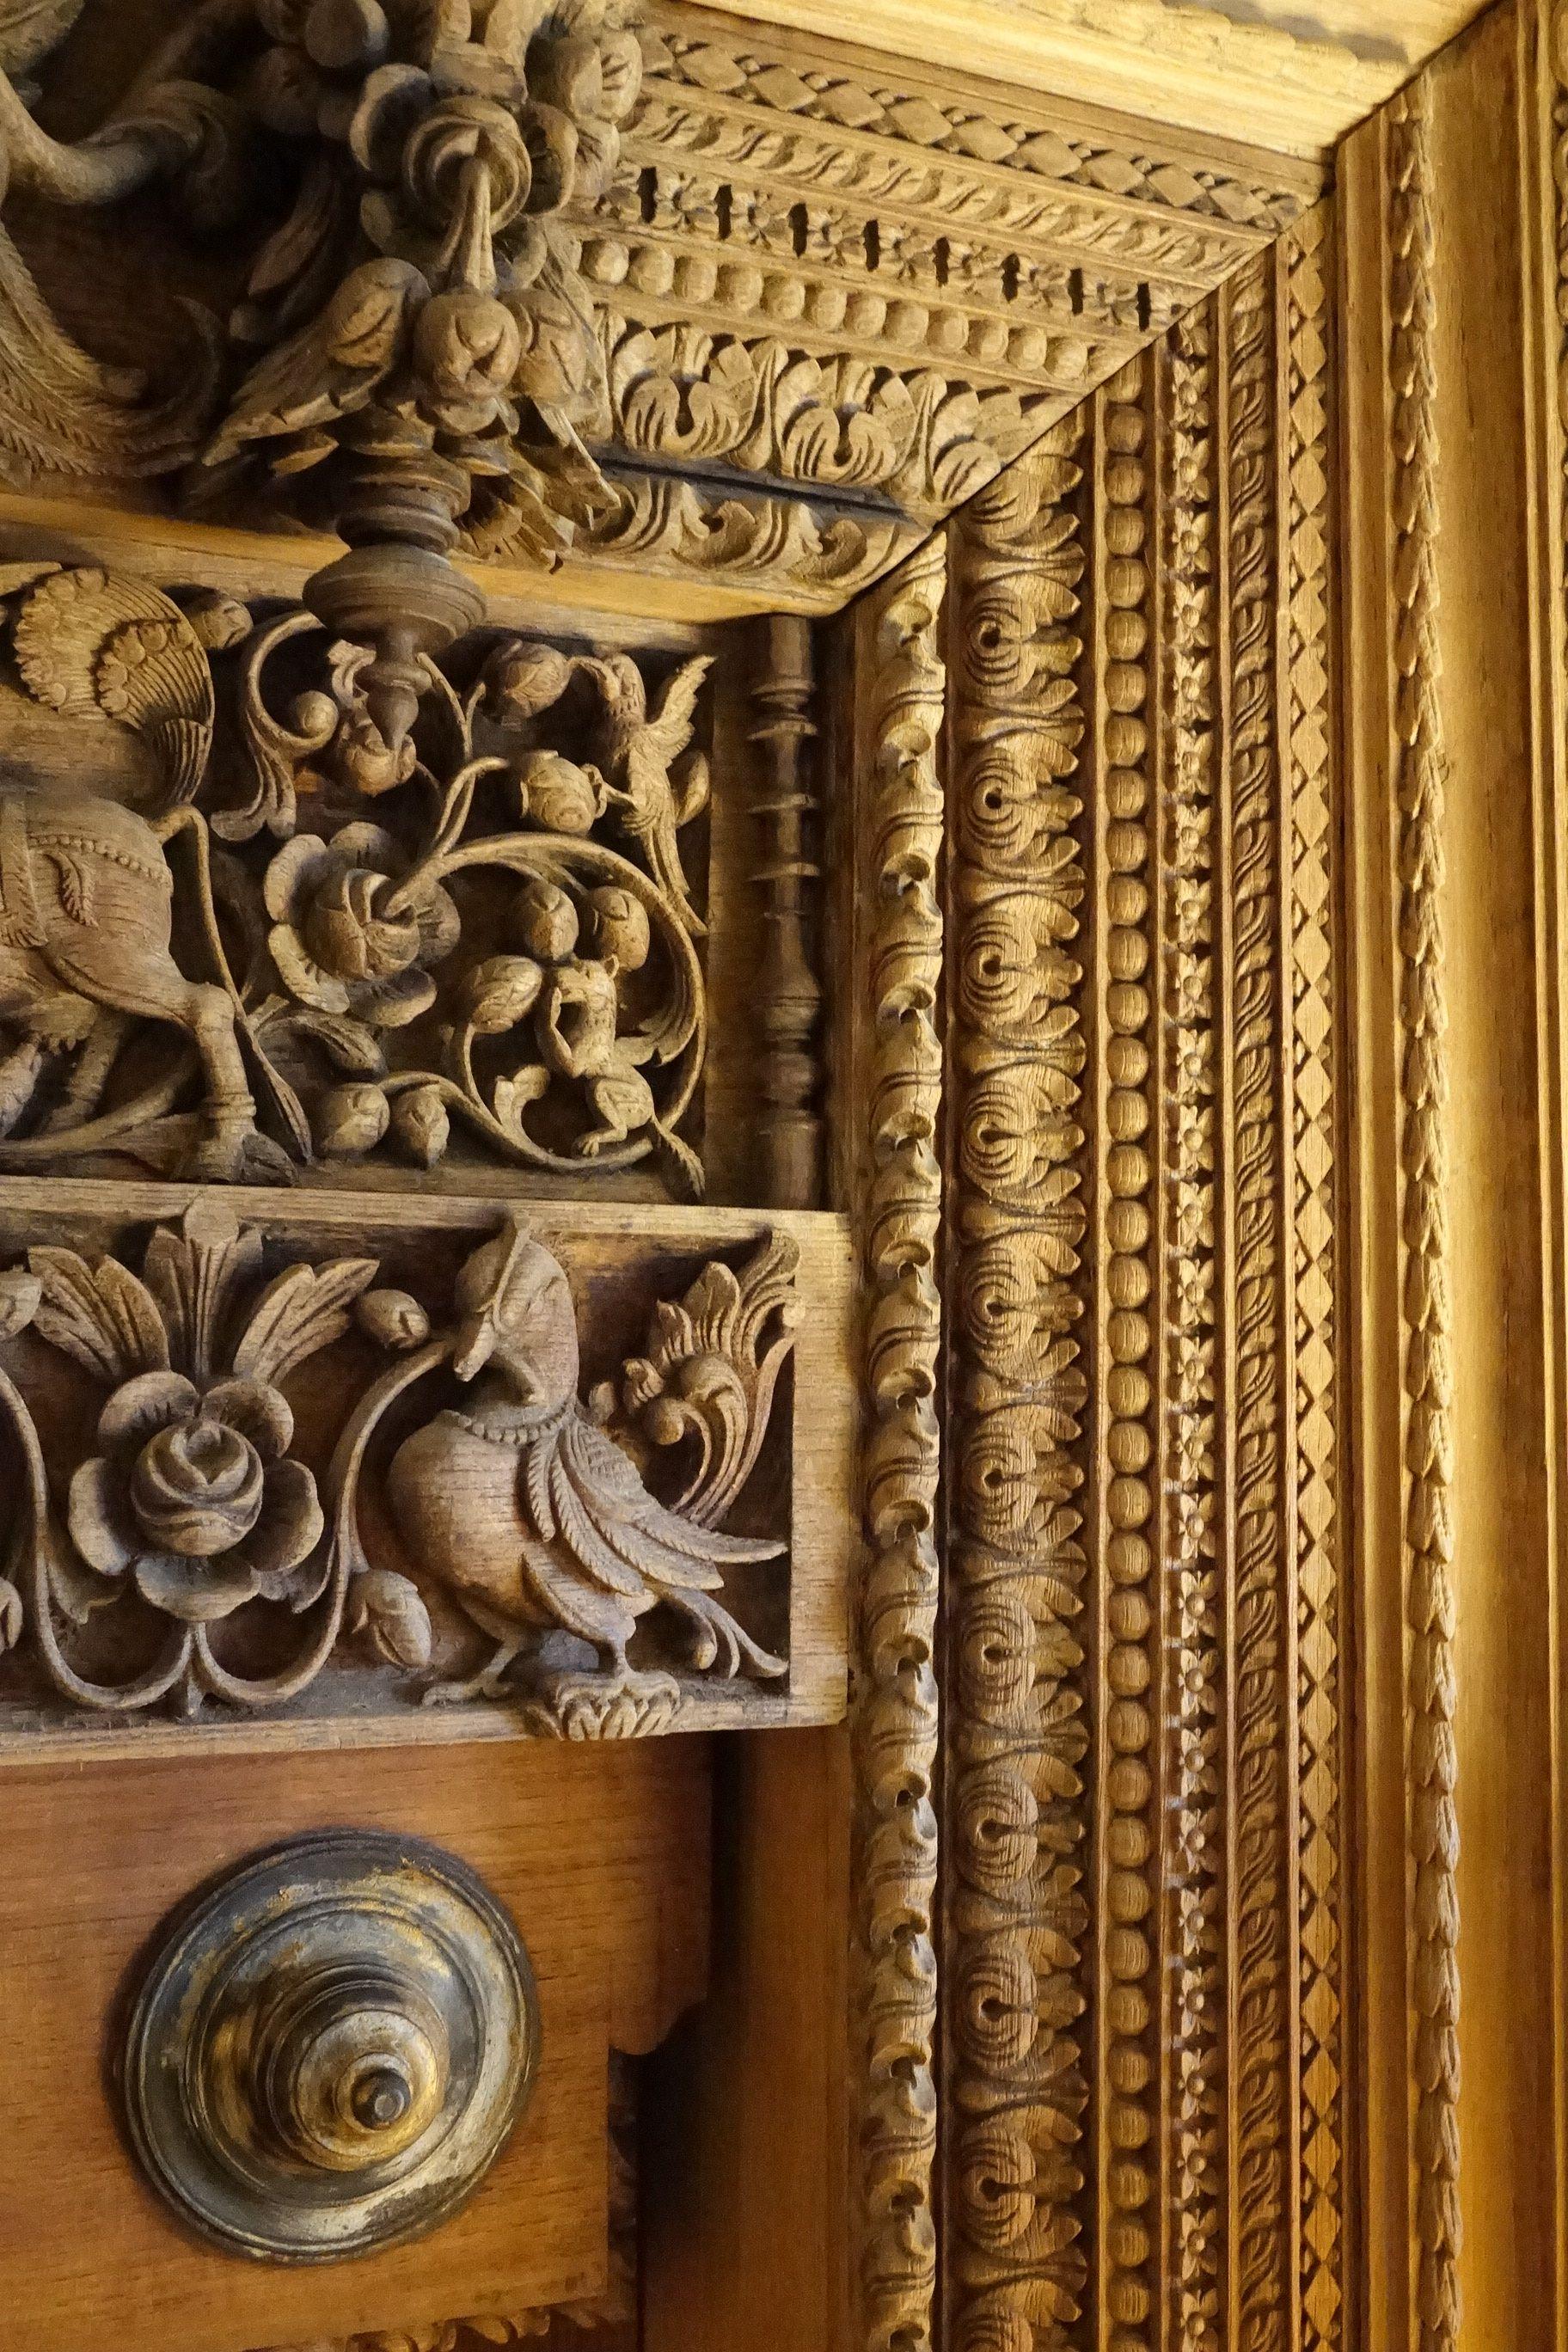 Classical Wooden Single Door Designs For Room: Pin By Studio Ebony On Antique Doors From Studio Ebony